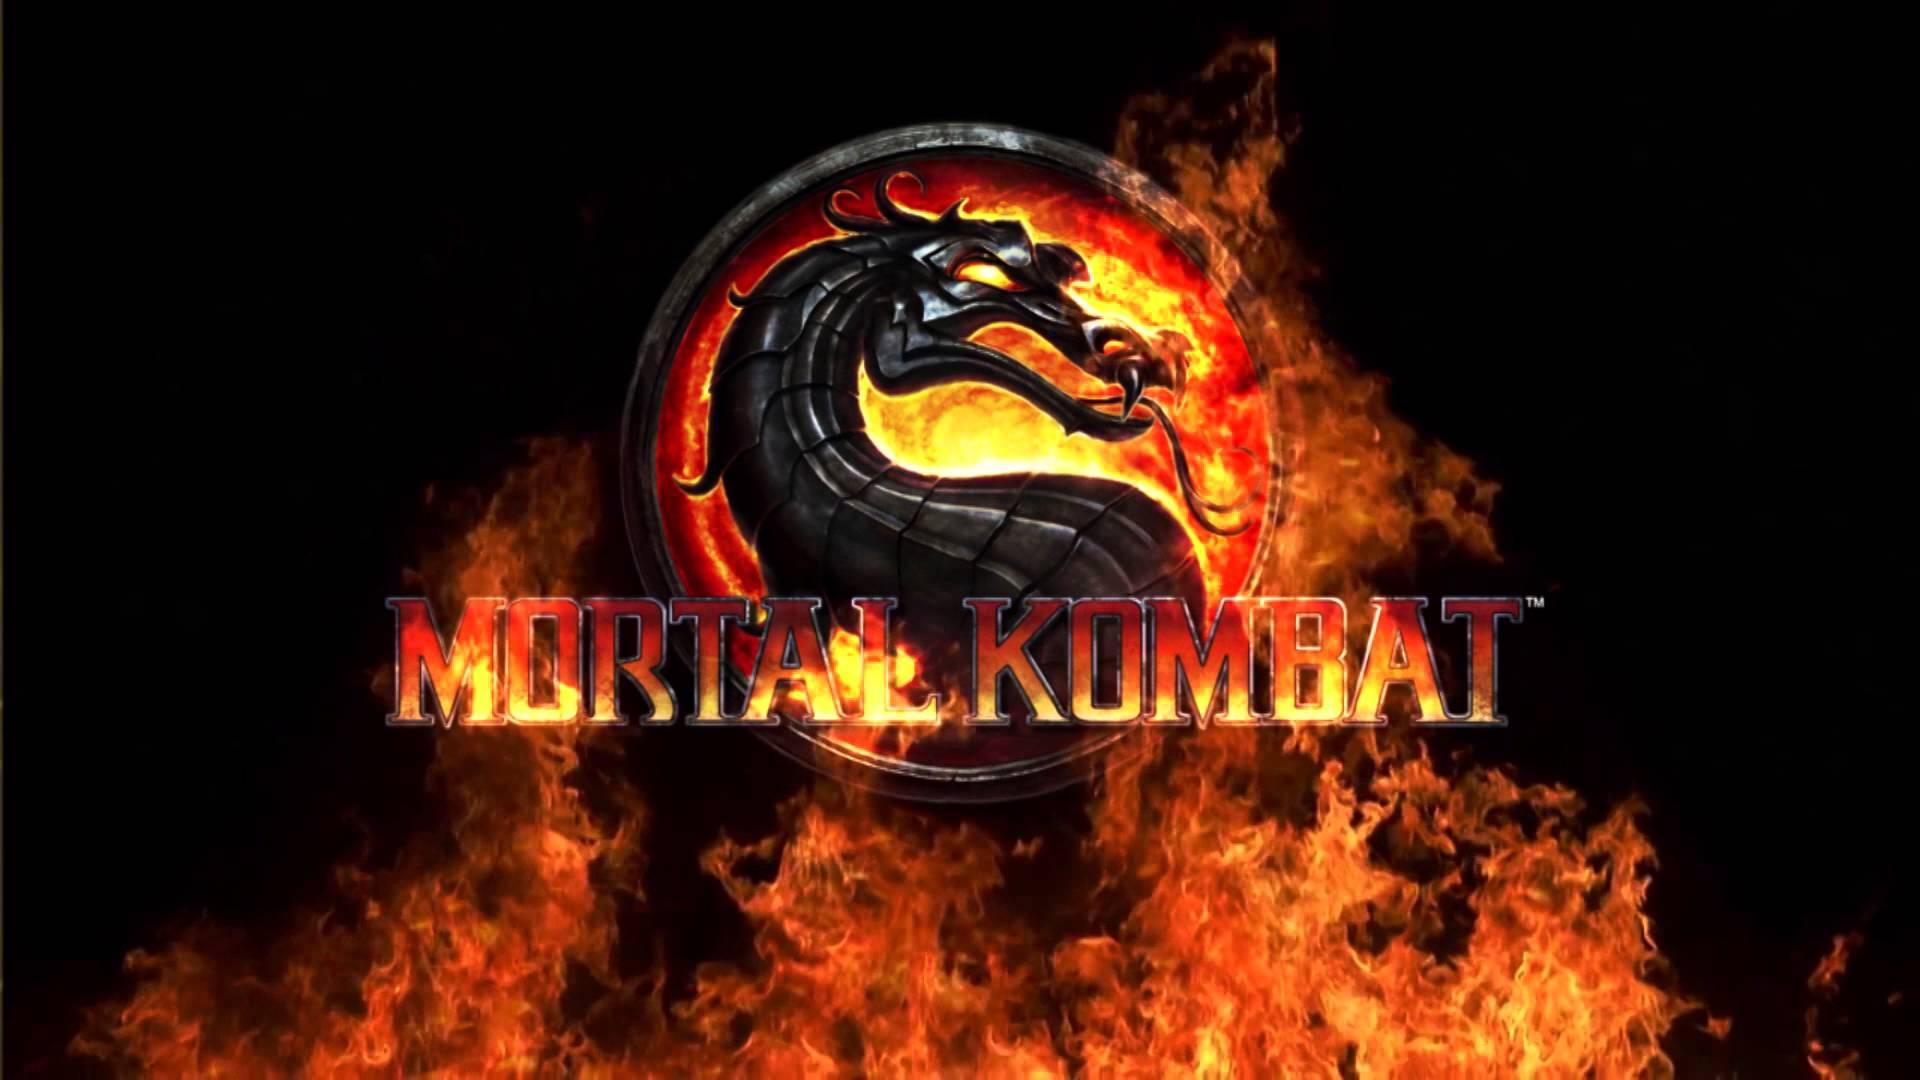 Filming underway on Mortal Kombat movie, Kung Lao cast